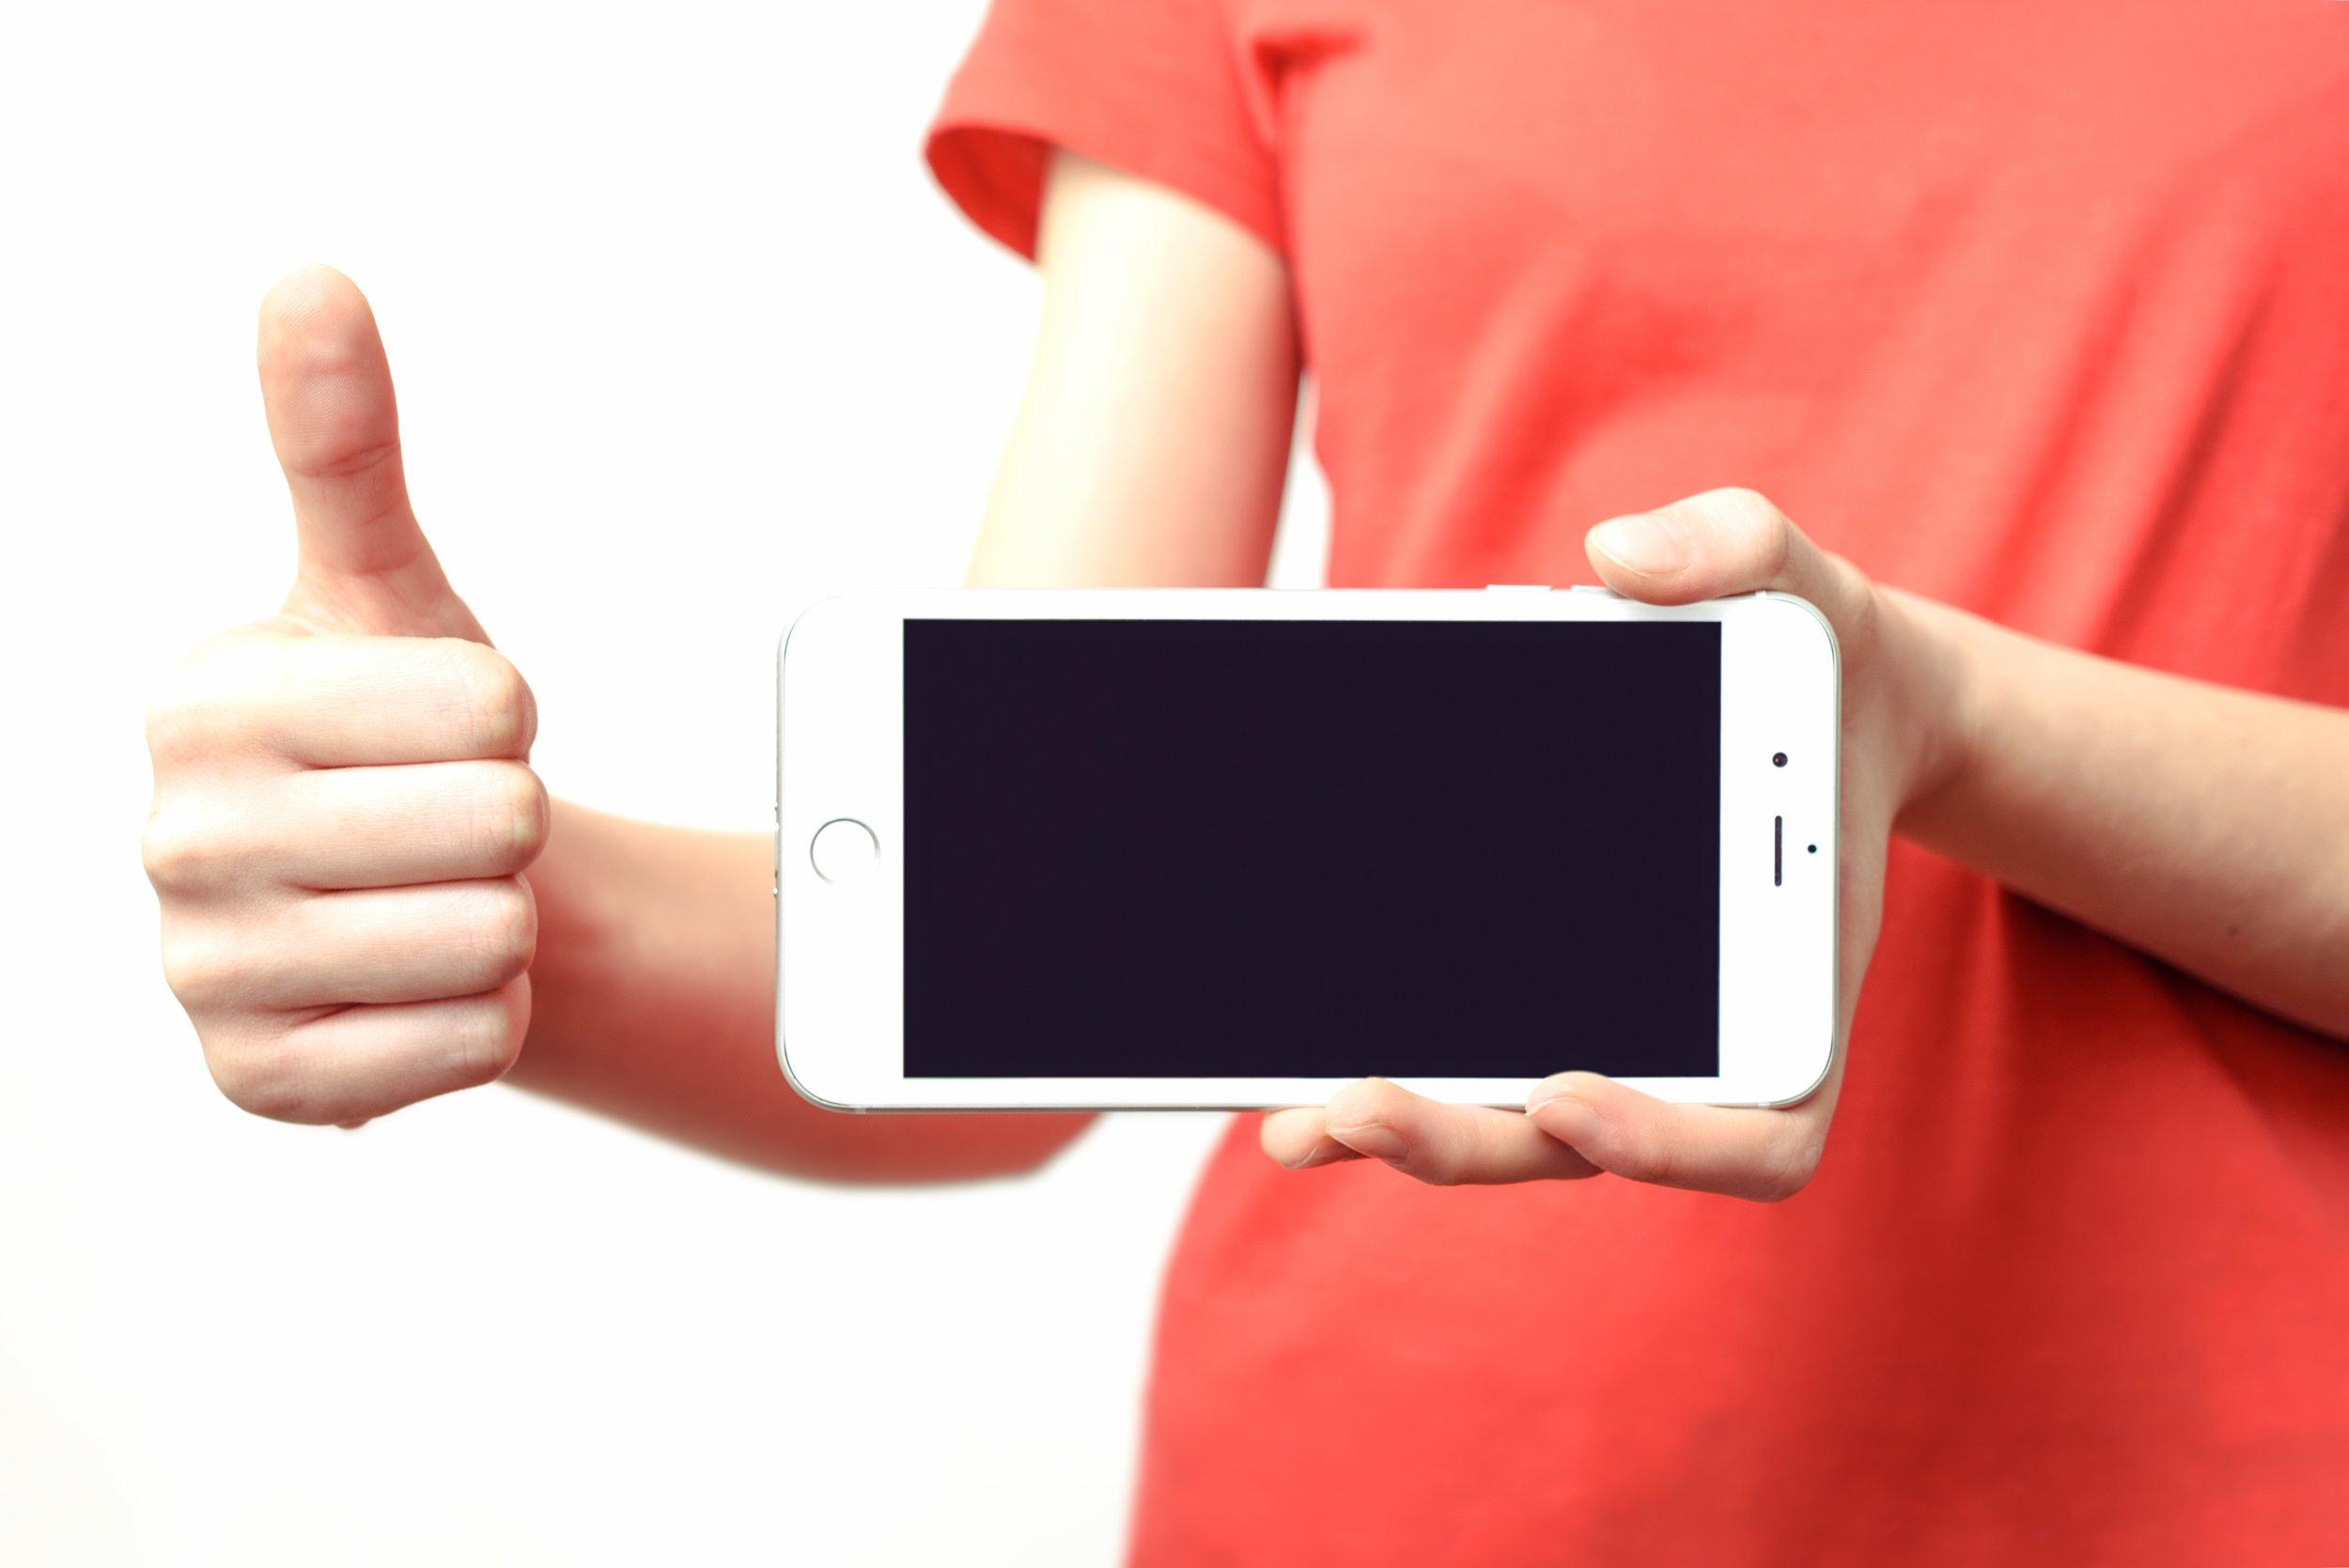 advertisement-communication-device-949602.jpg